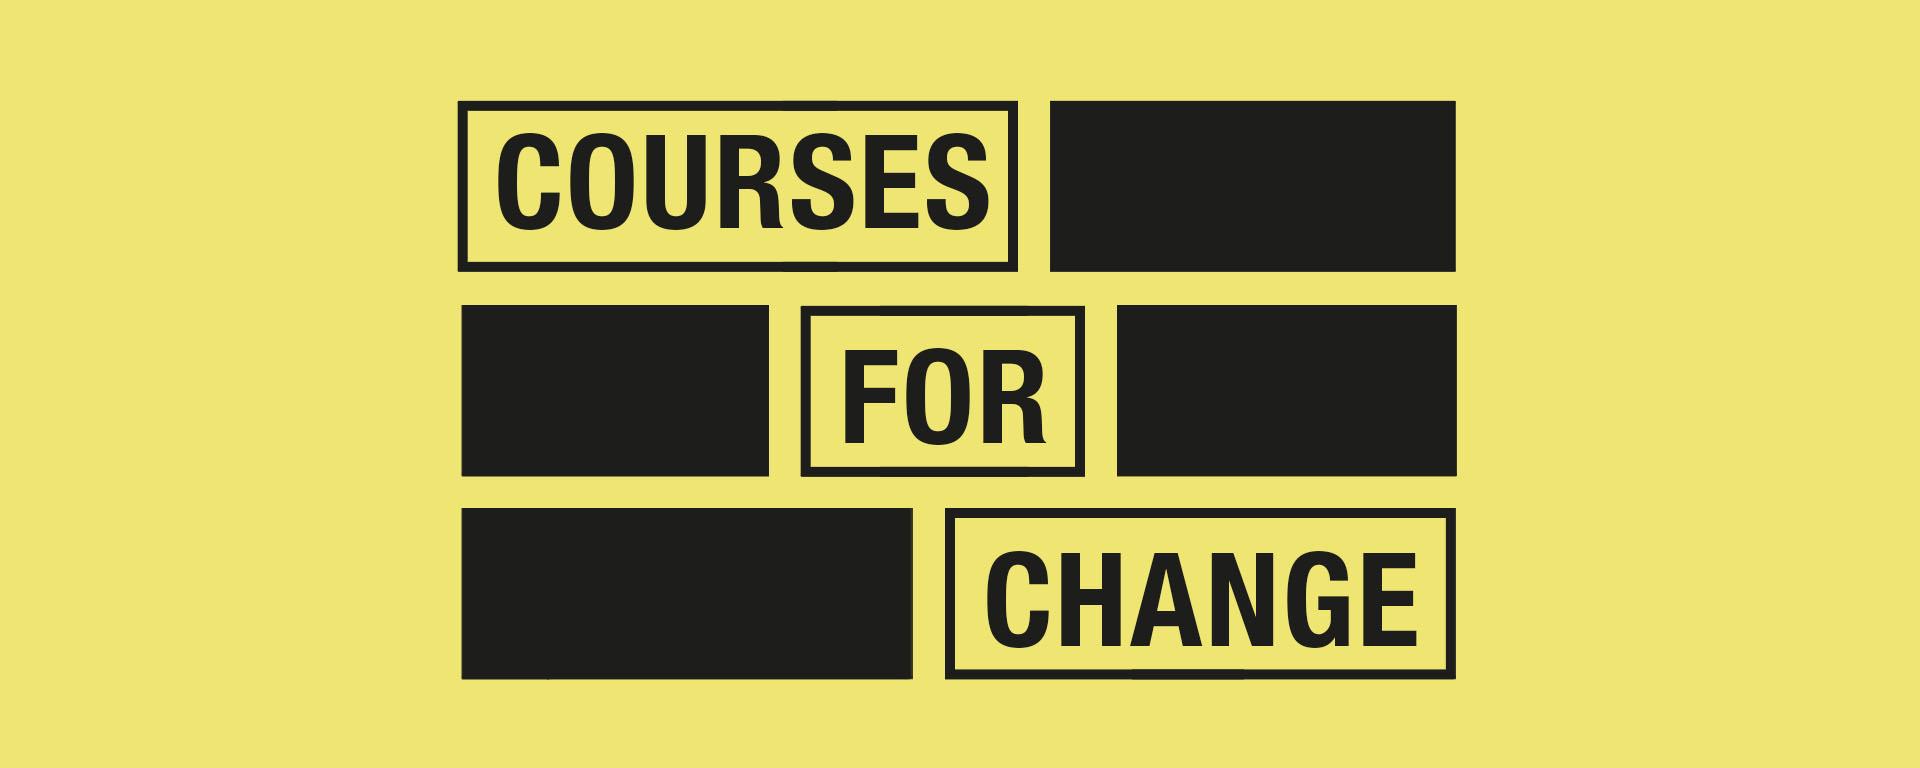 Workshop, training, courses for change management, transformation